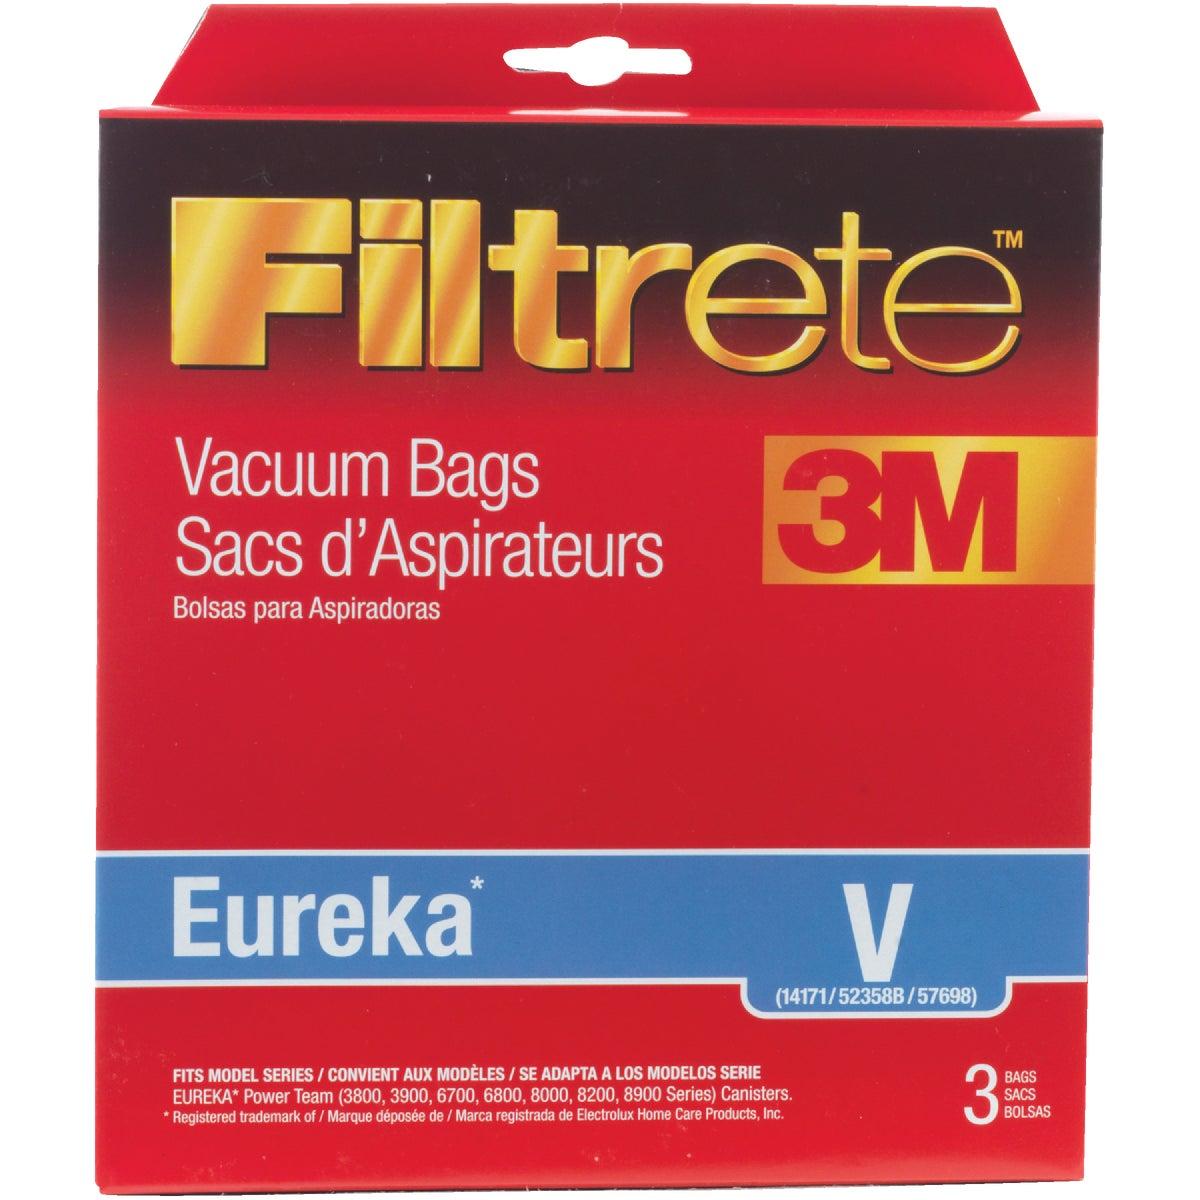 EUREKA V VACUUM BAG - 67716-6 by Electrolux Home Care